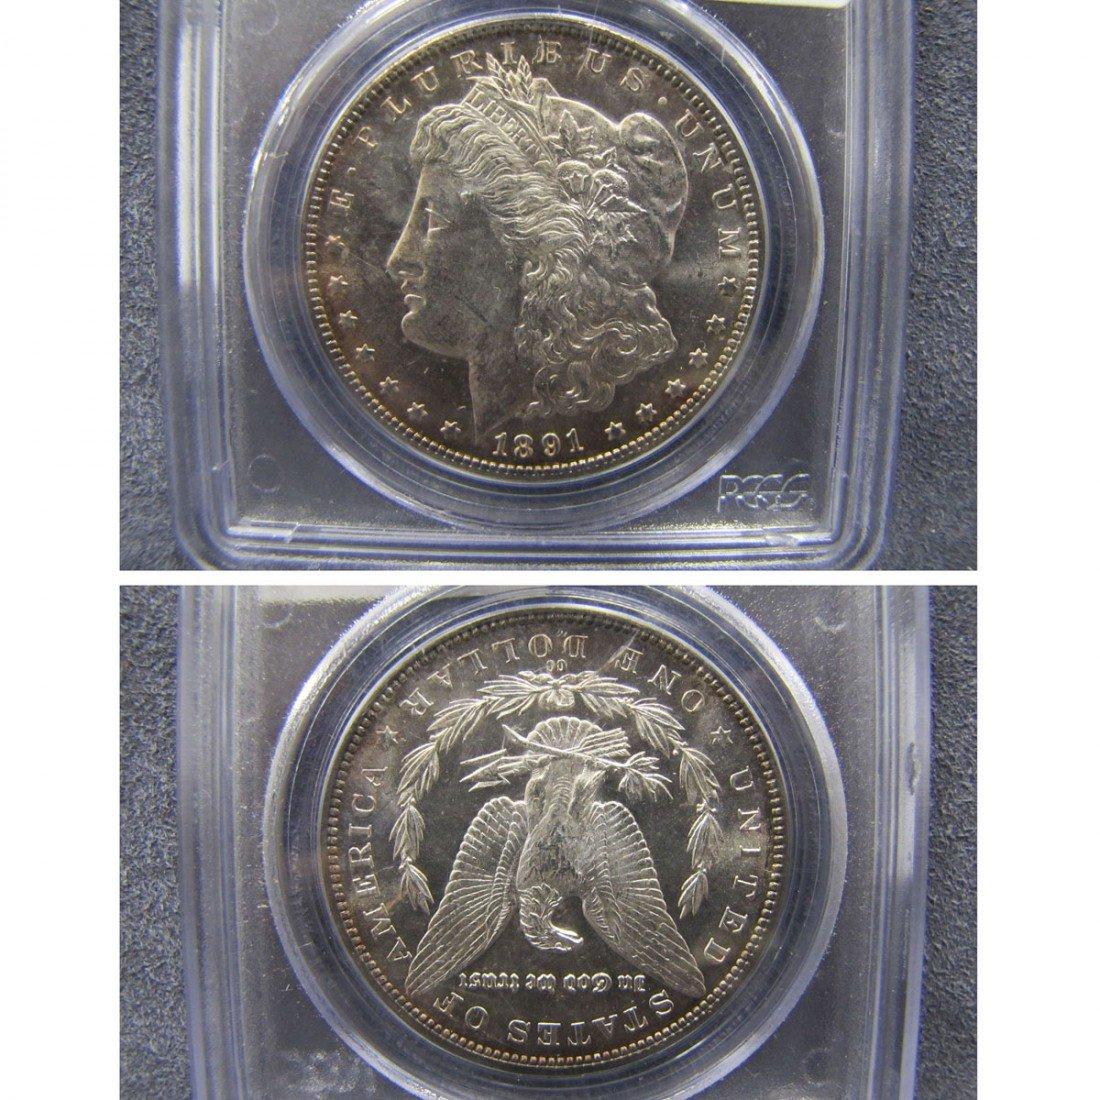 3: 1891 CC MORGAN SILVER DOLLAR, PCGS MS63